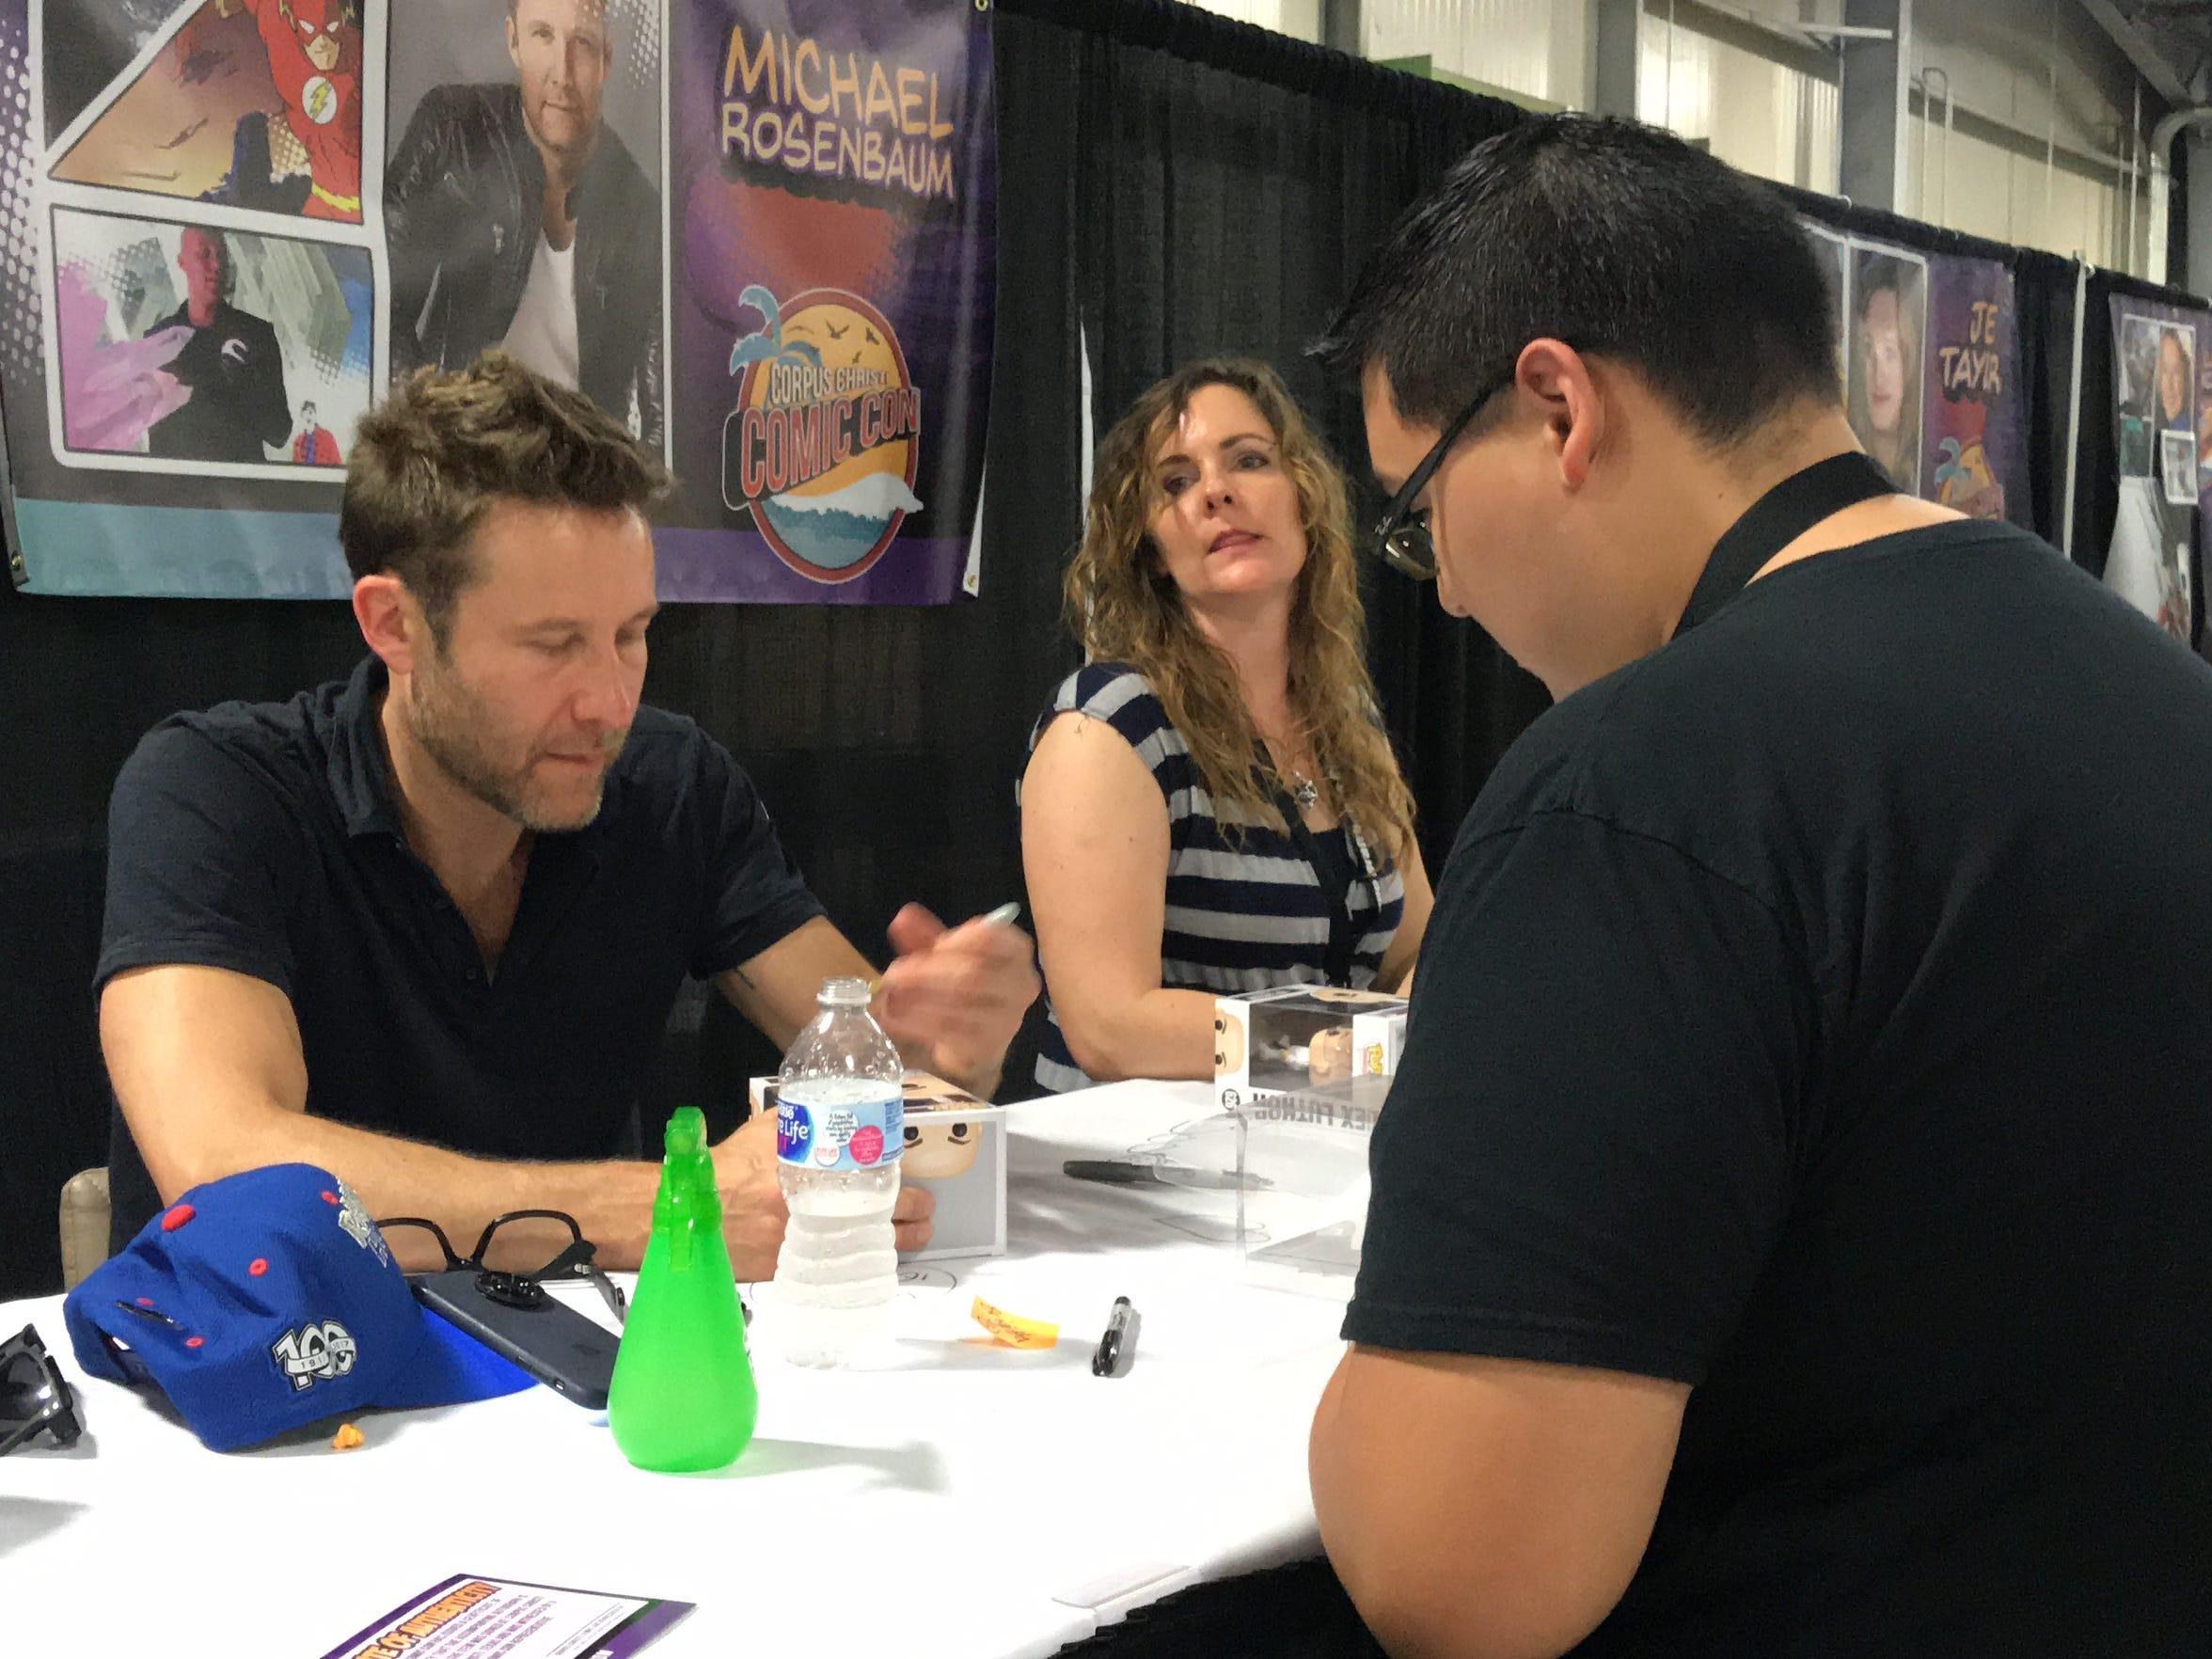 Actor Michael Rosenbaum signs a fan's pop figure at the second annual Corpus Christi Comic Con Saturday, June 23, 2018.